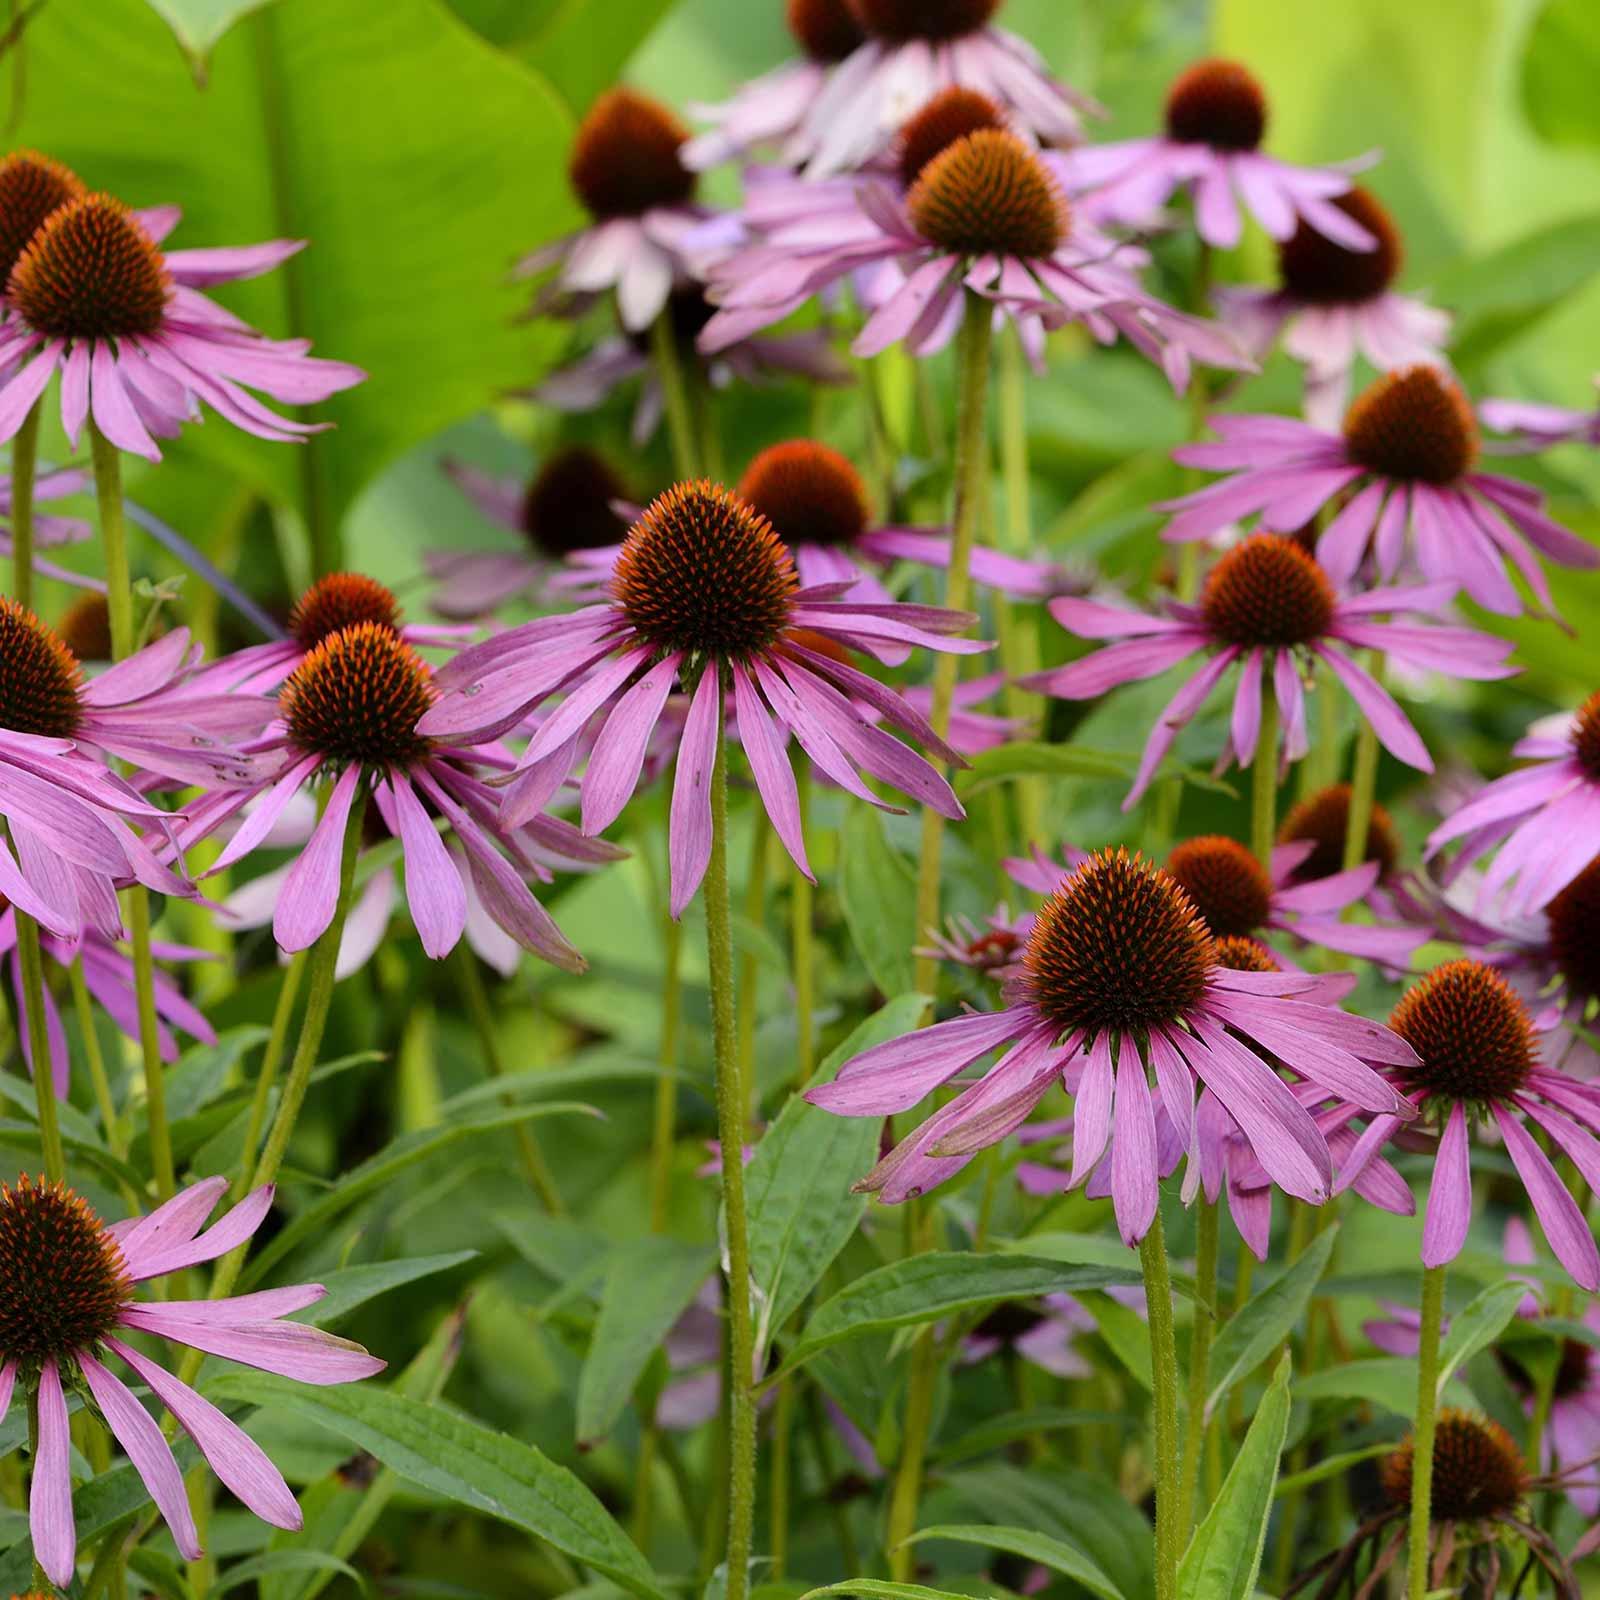 Purple Coneflower Wild Flower Seeds 1 Oz Perennial Wildflowers